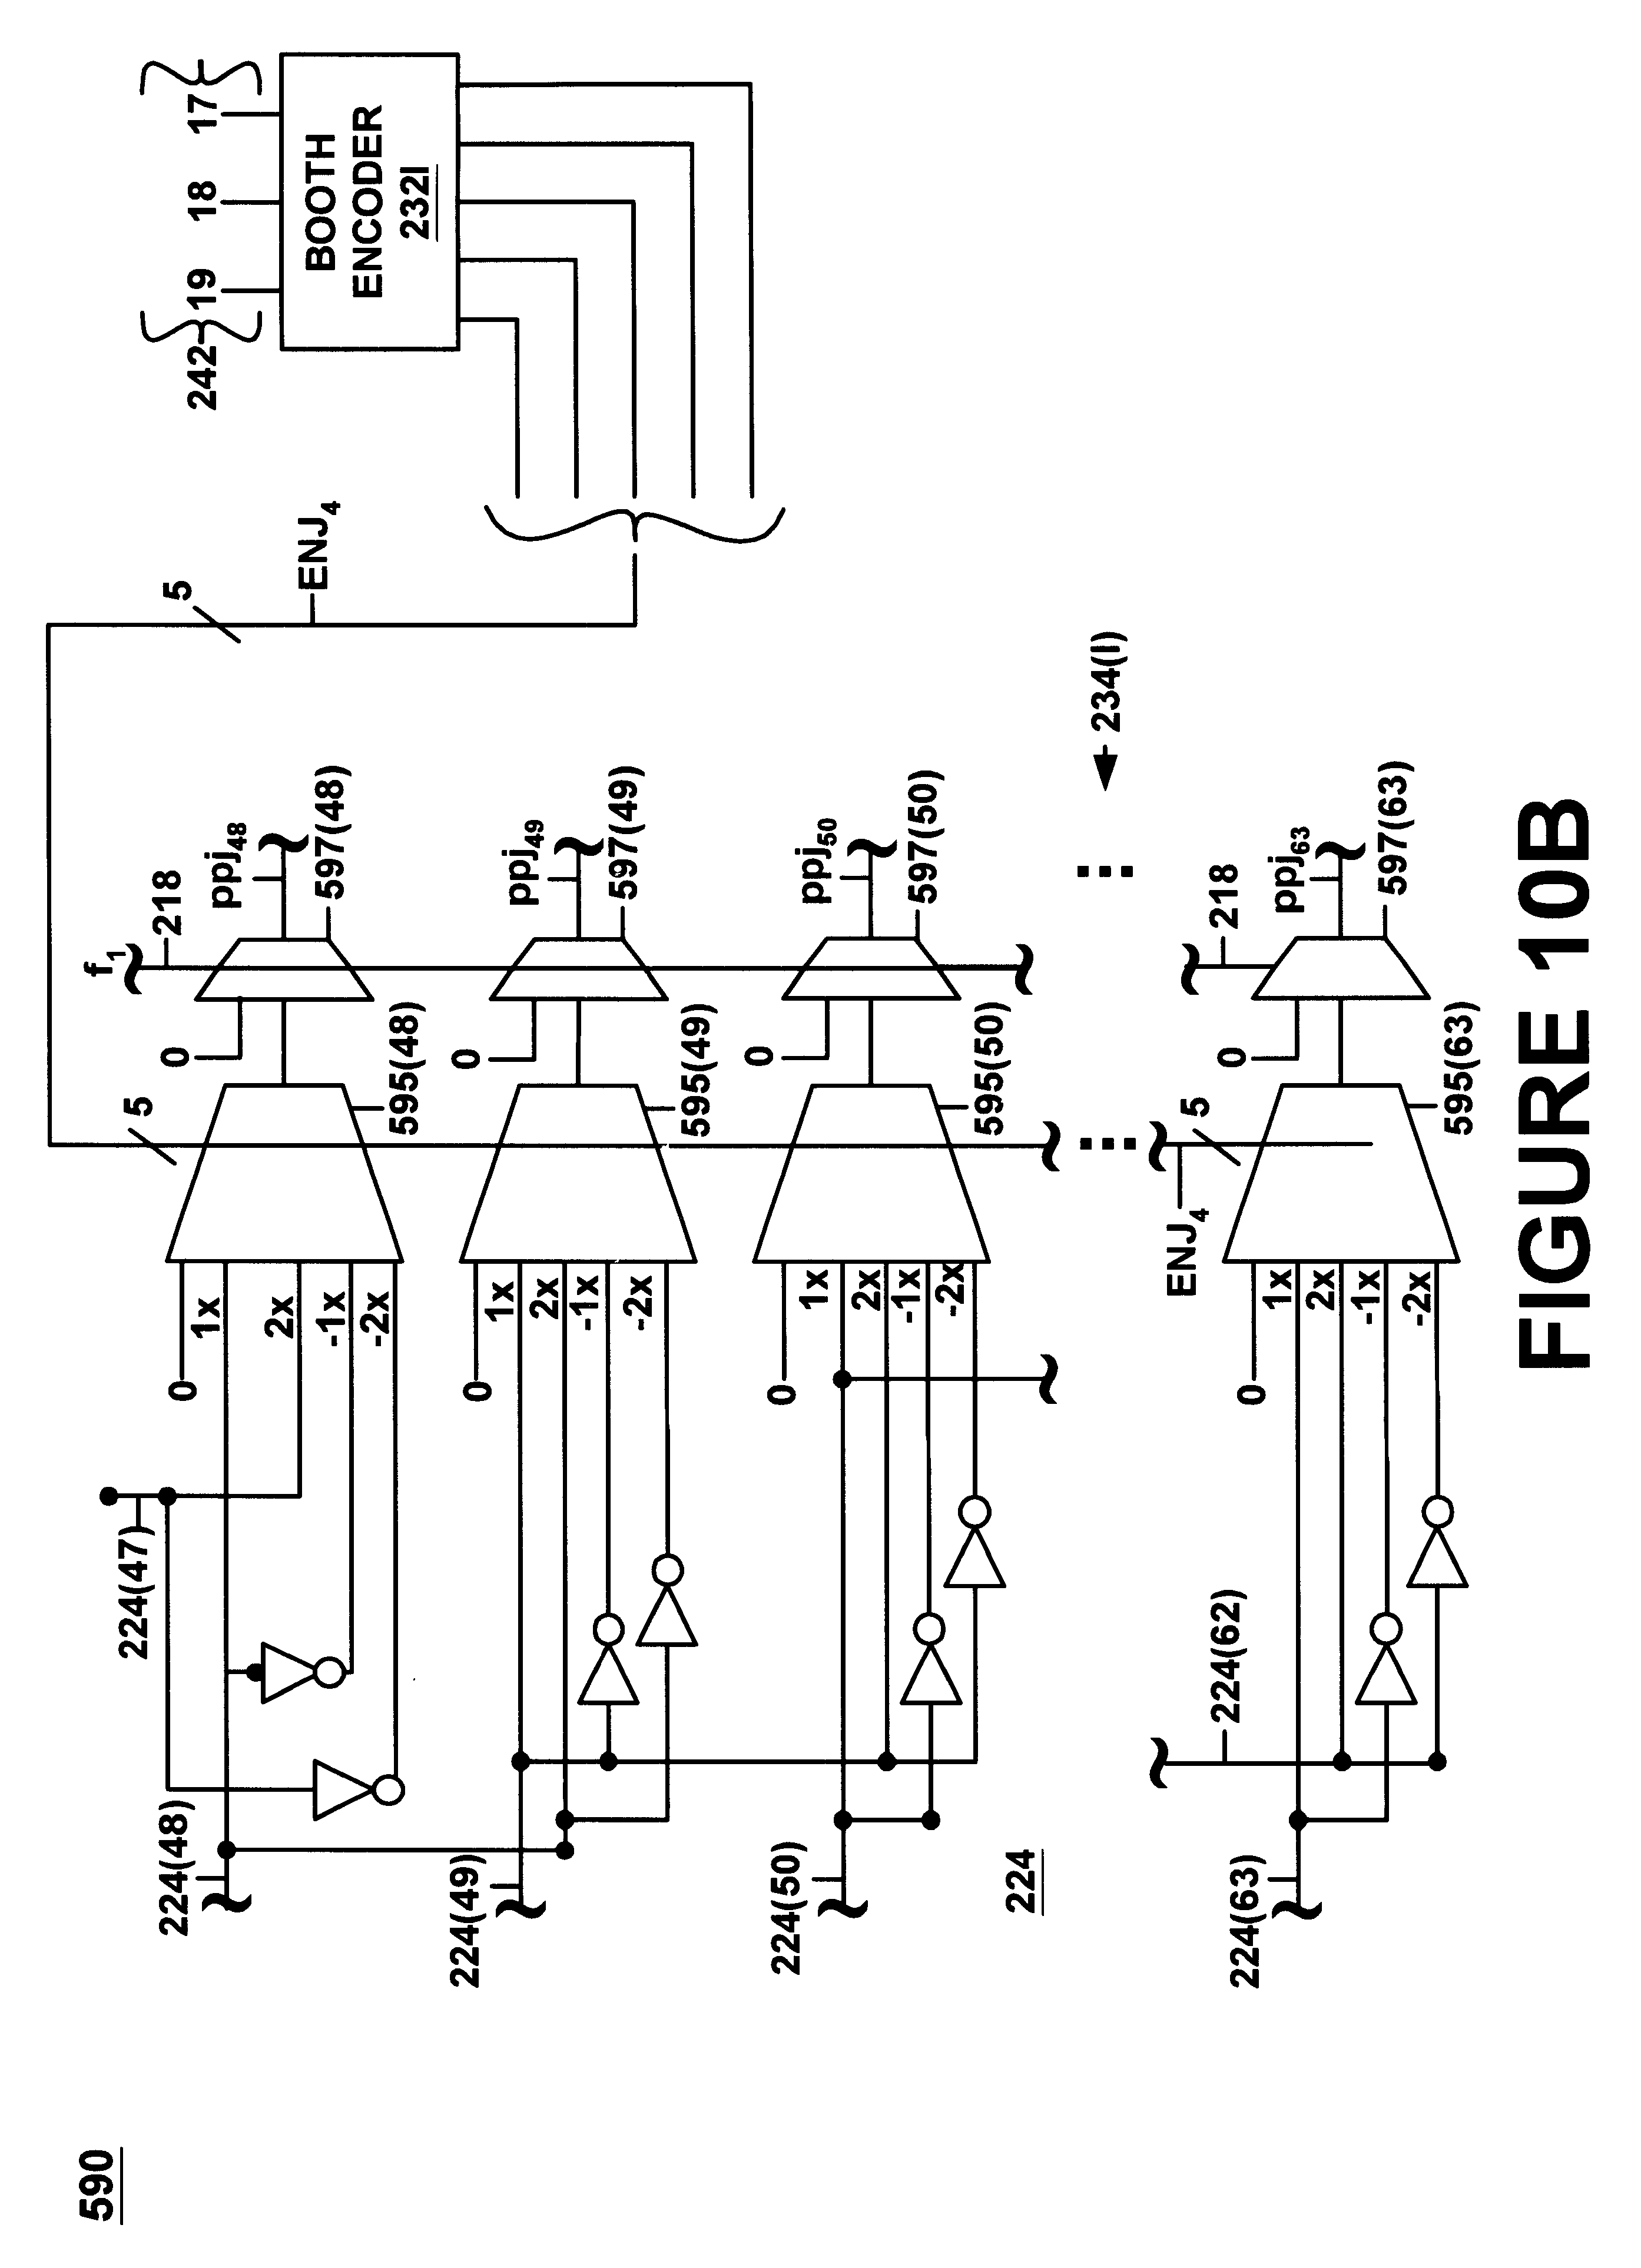 patent us6353843 - high performance universal multiplier circuit